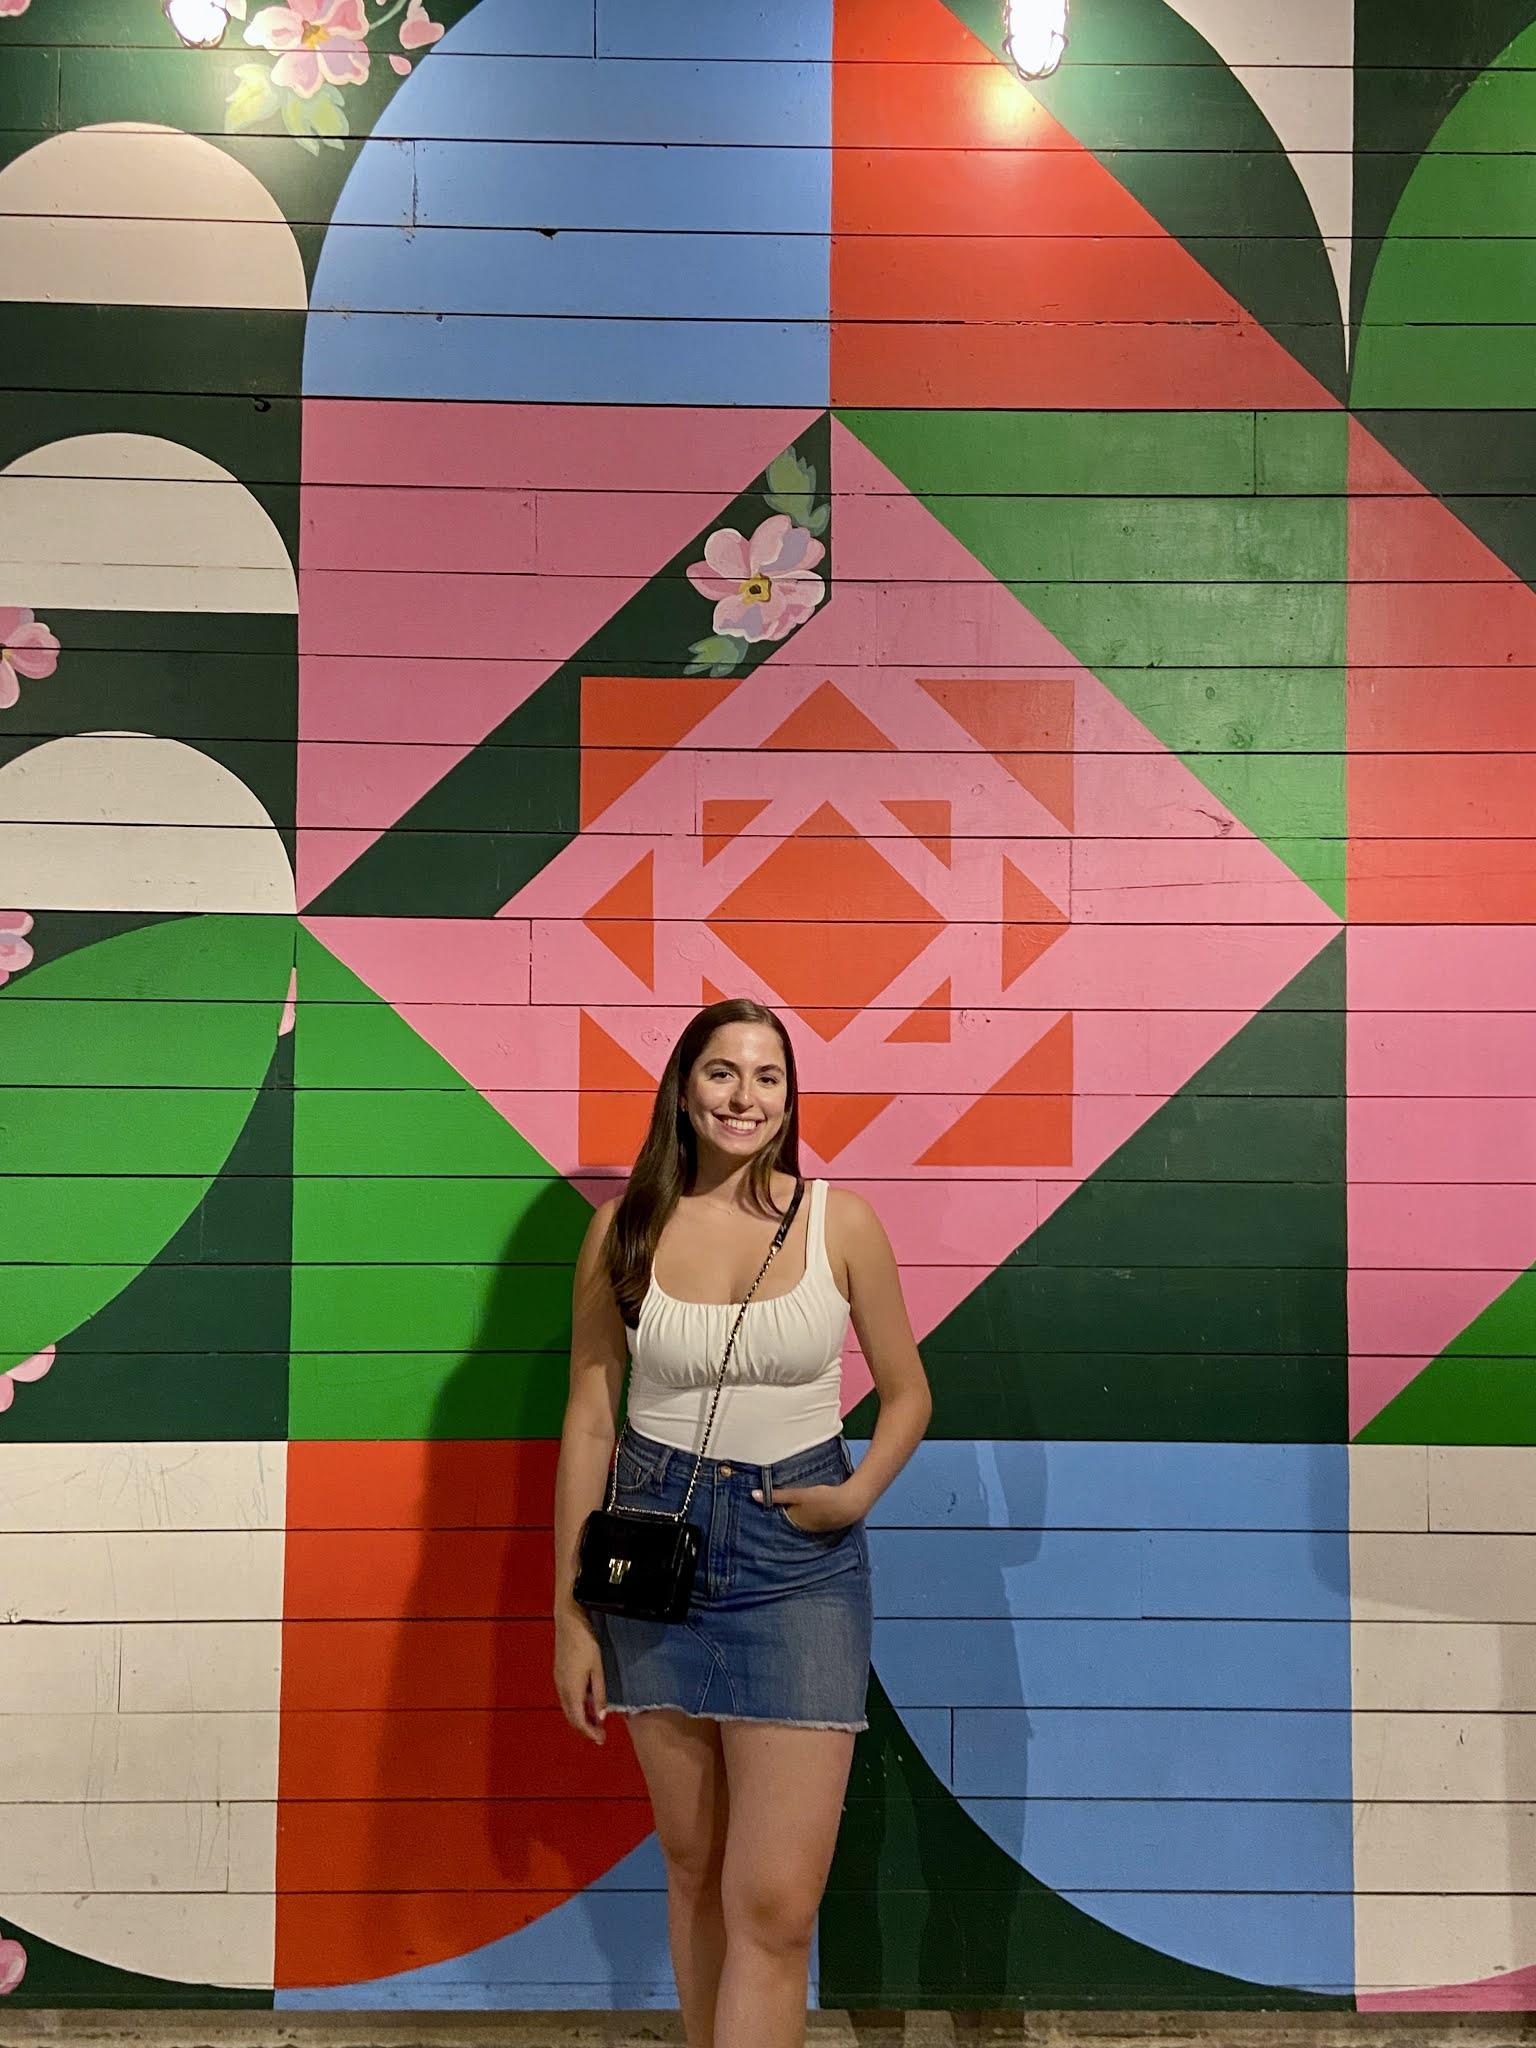 chicago murals, chicago art, explore chicago, travel guide chicago